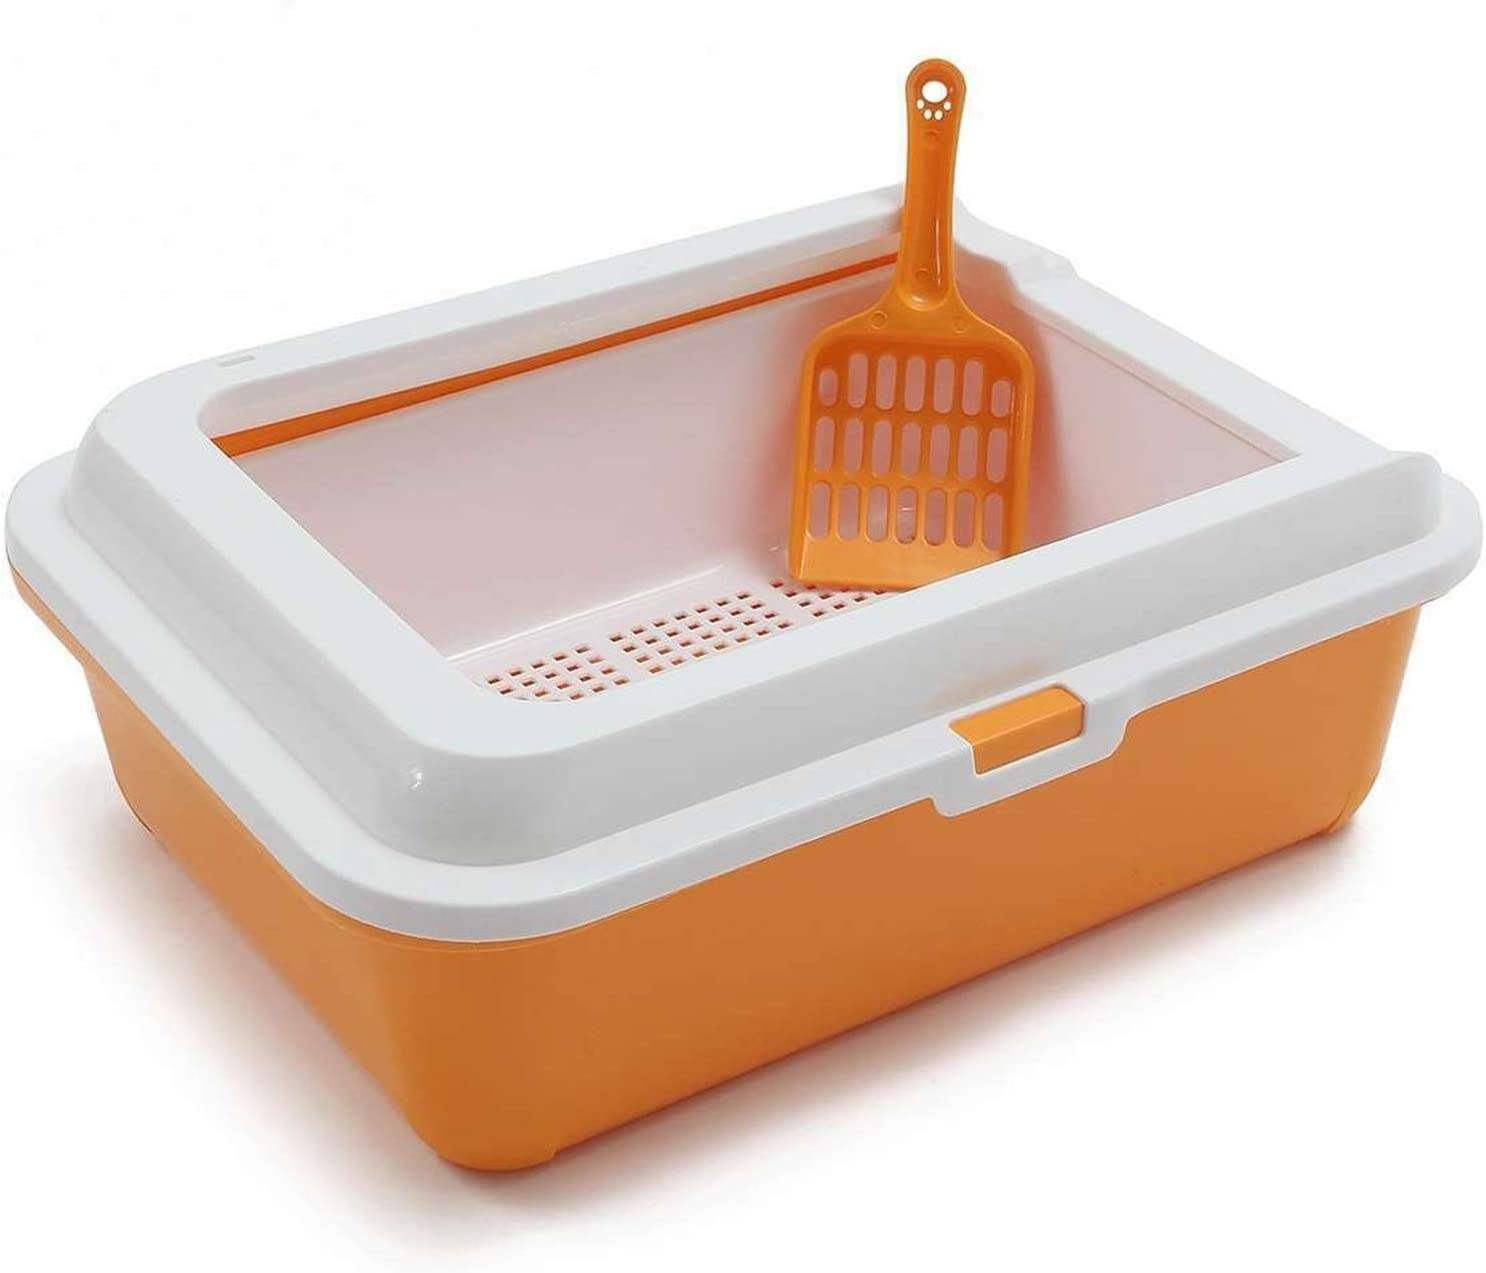 XIAOLI Cat Litter unisex Box Pet Toilet Tray Large discharge sale Bedpan Supplies